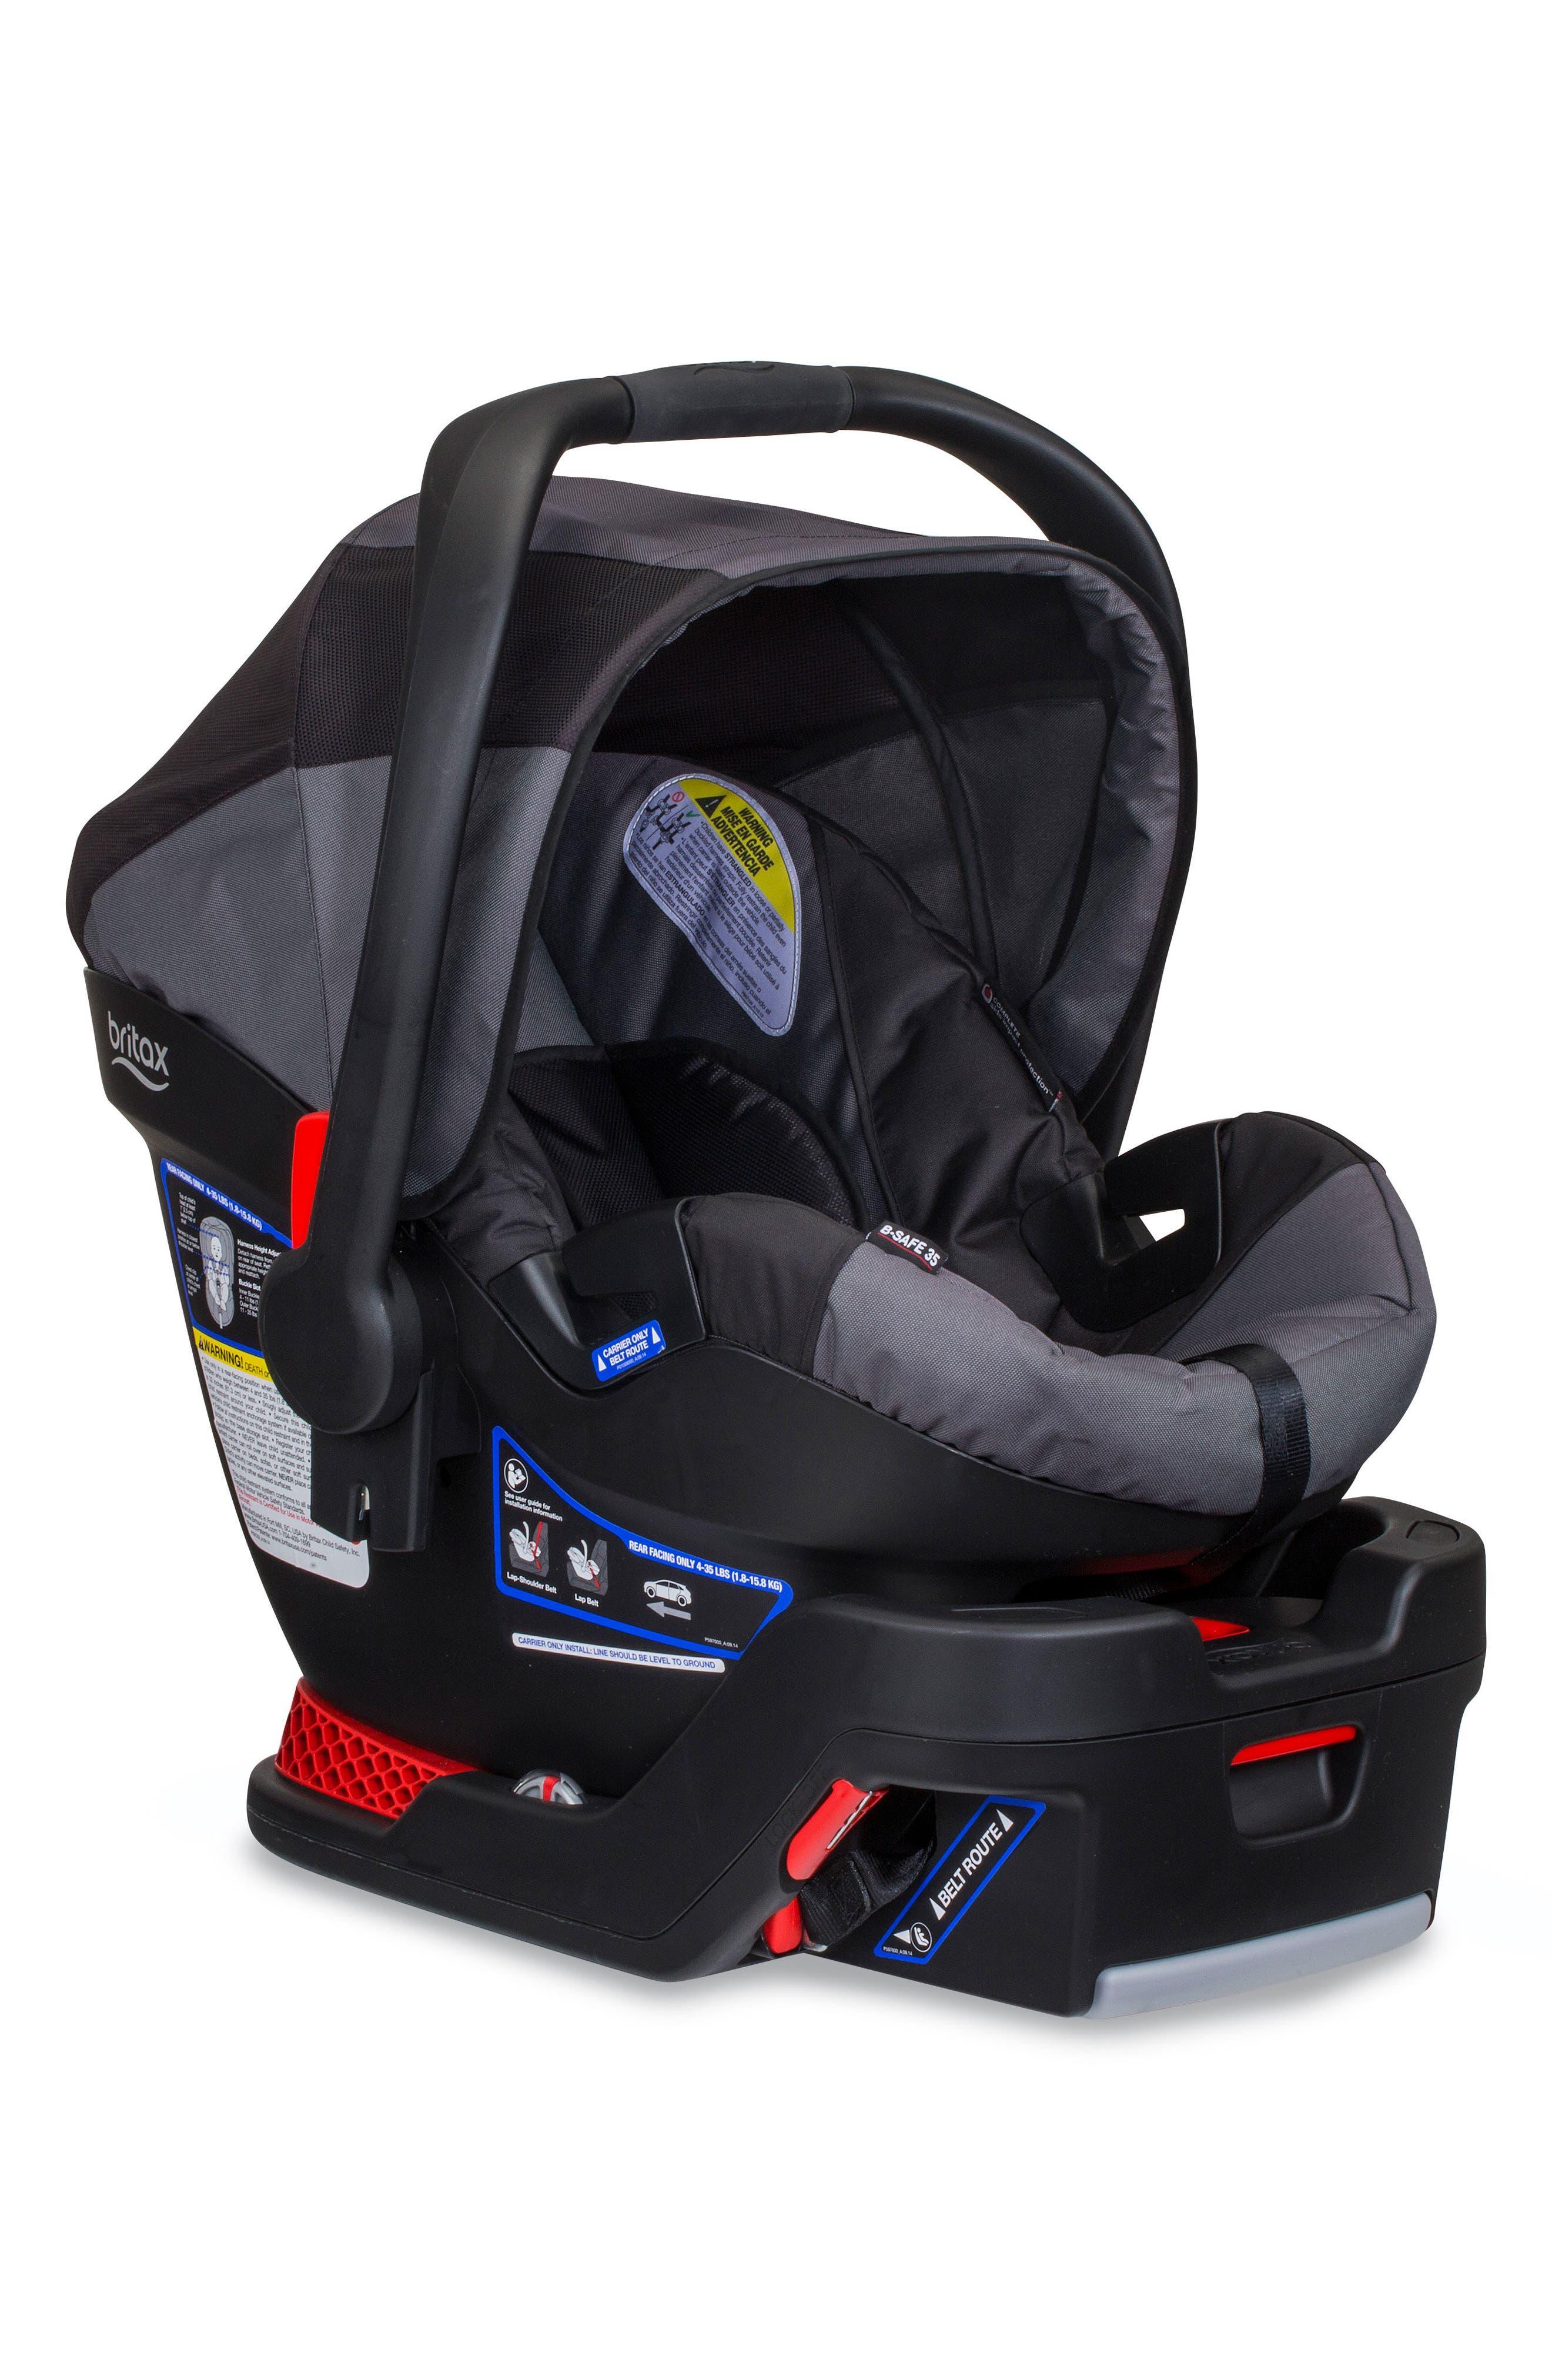 BOB B-Safe 35 by Britax Infant Car Seat & Base, Main, color, 001